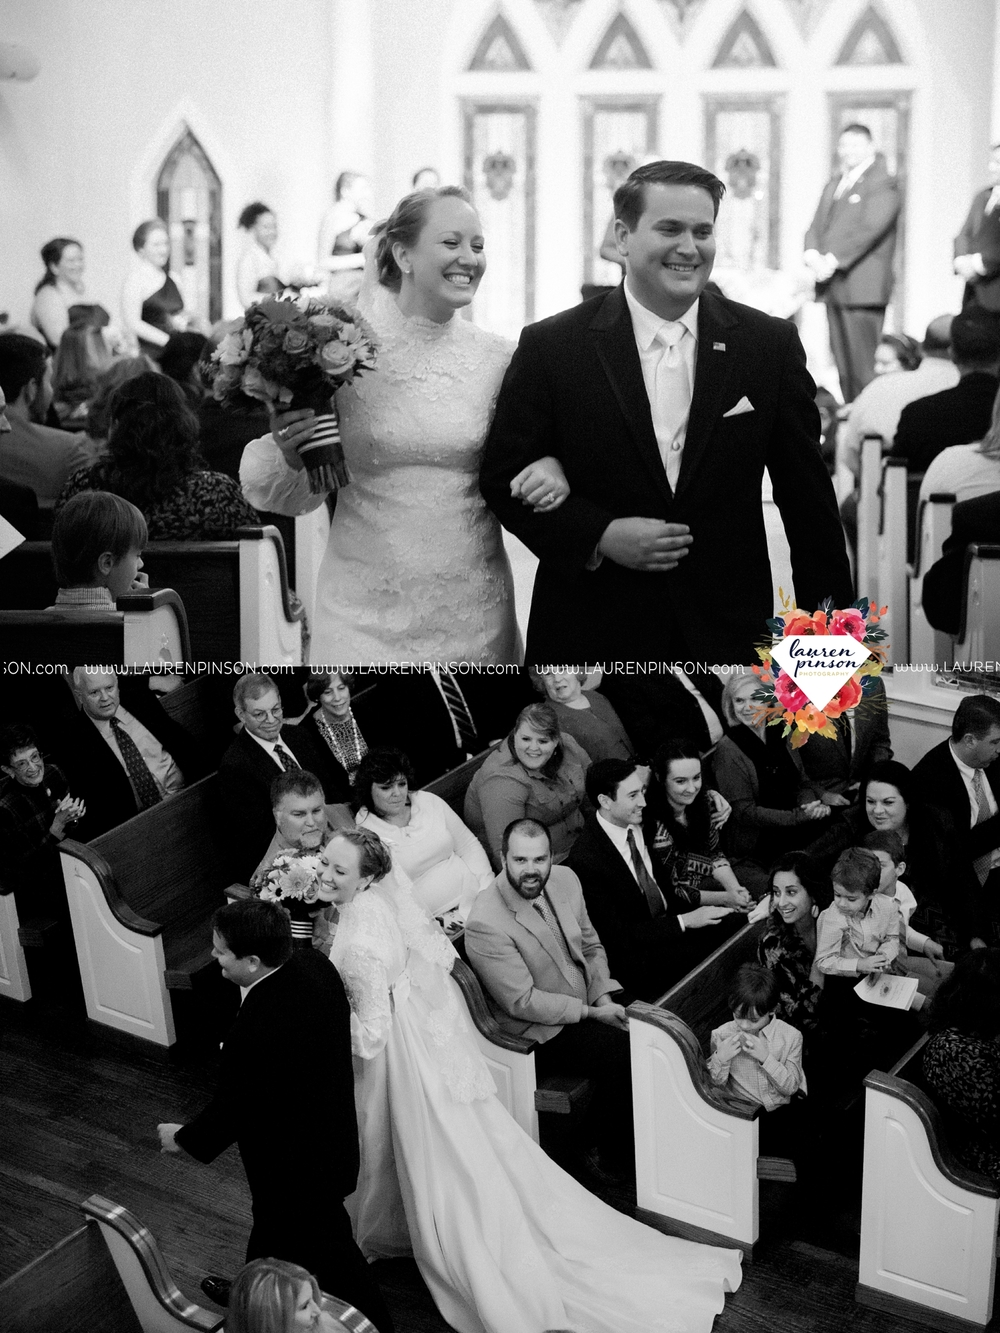 bells-texas-wedding-photography-at-willowood-ranch-chapel-north-texas-wichita-falls-wedding-photographer_1878.jpg